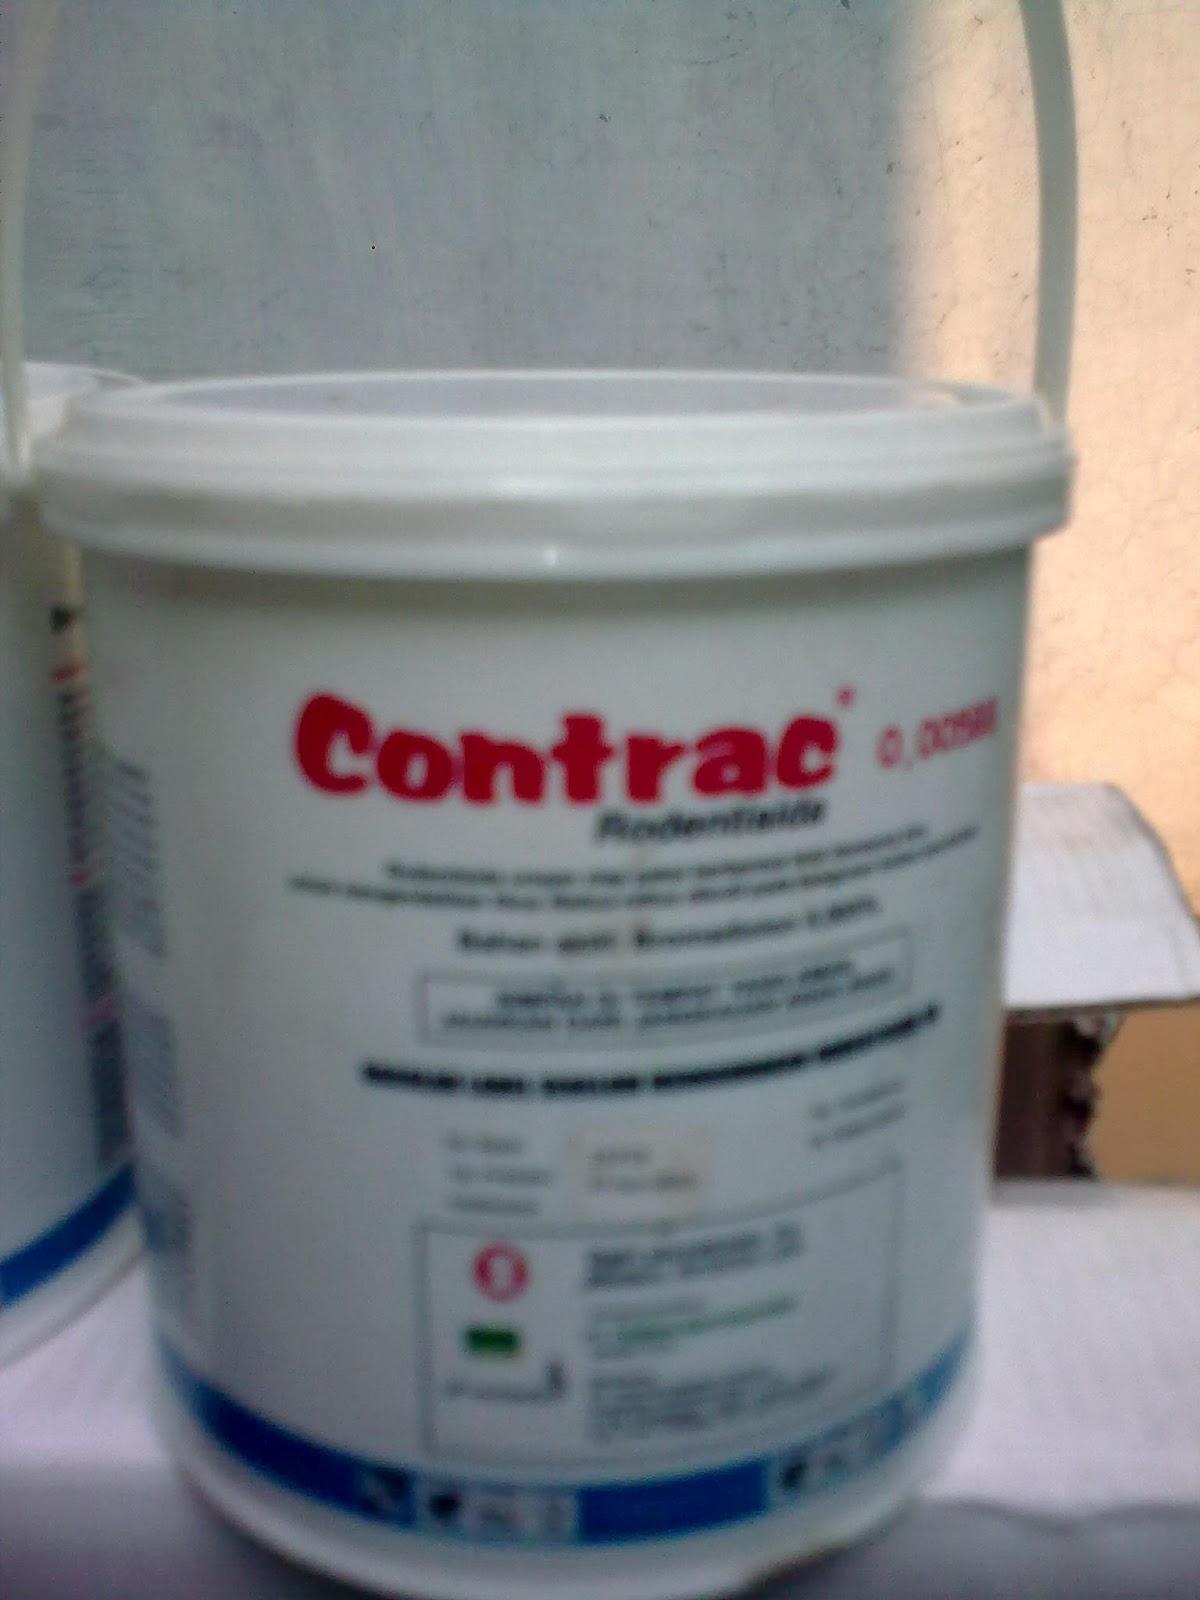 Supplier Obat Hama Lingkungan Maret 2012 Mustang Nyamuk Fogging Contrac 0005 Br